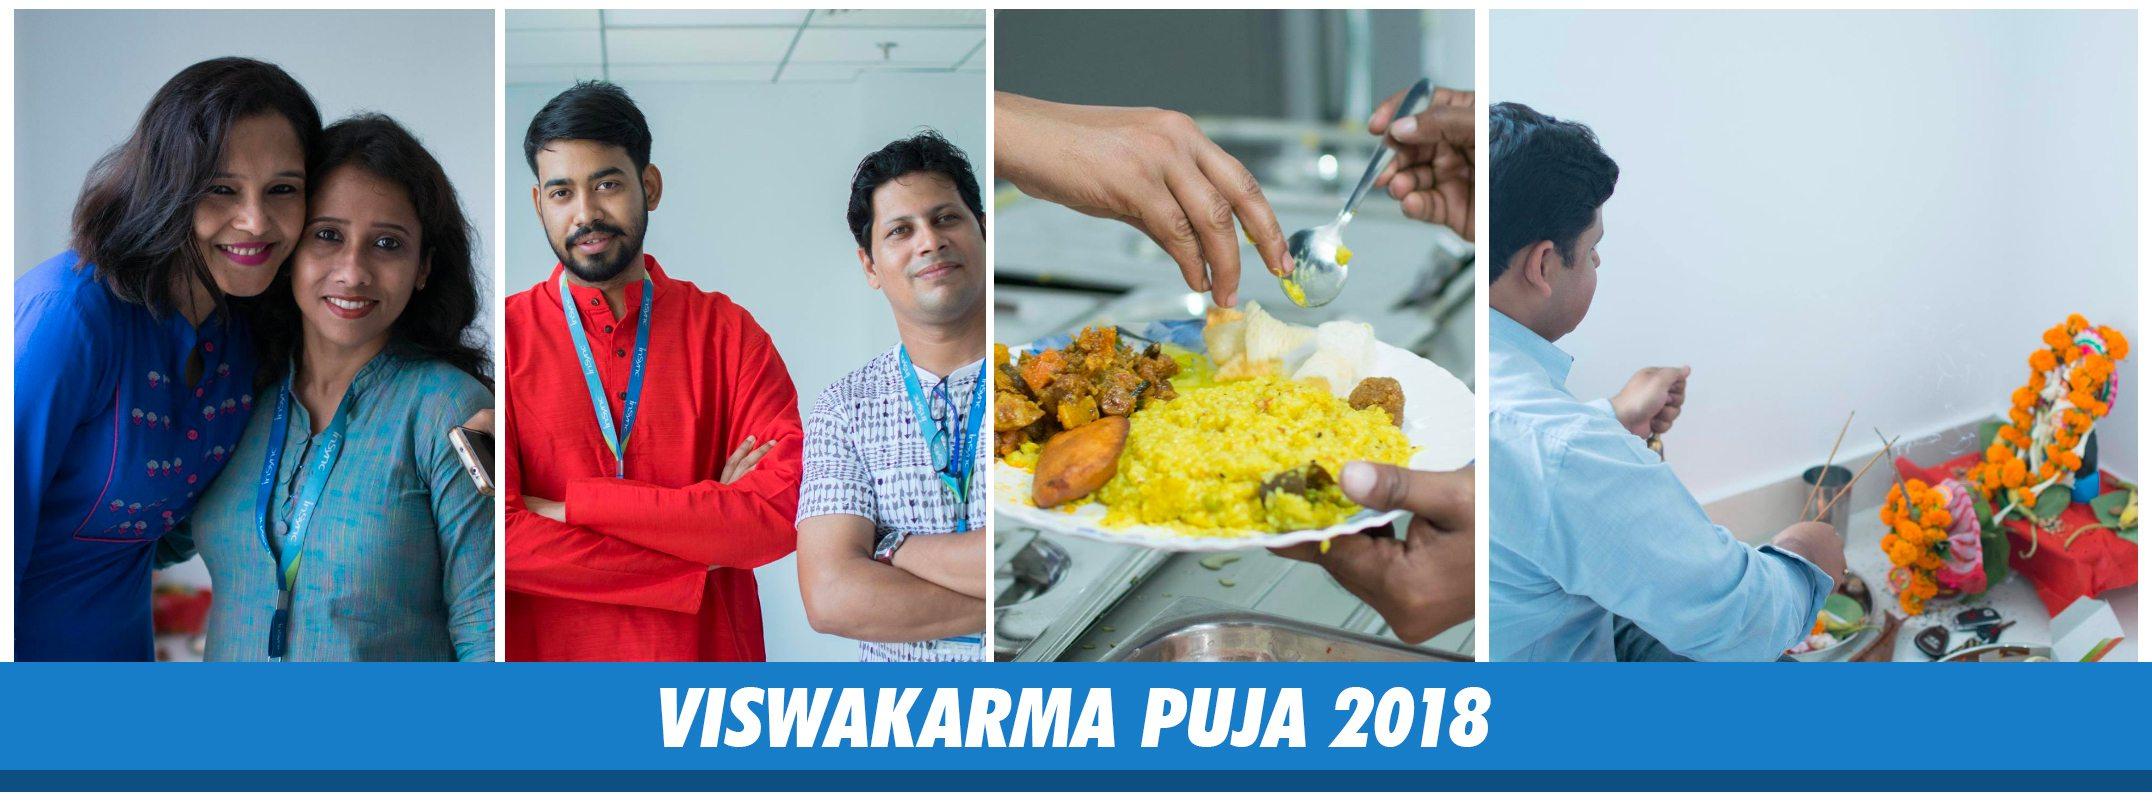 APPSeCONNECT-celebrating-Viswakarma-Puja-2018